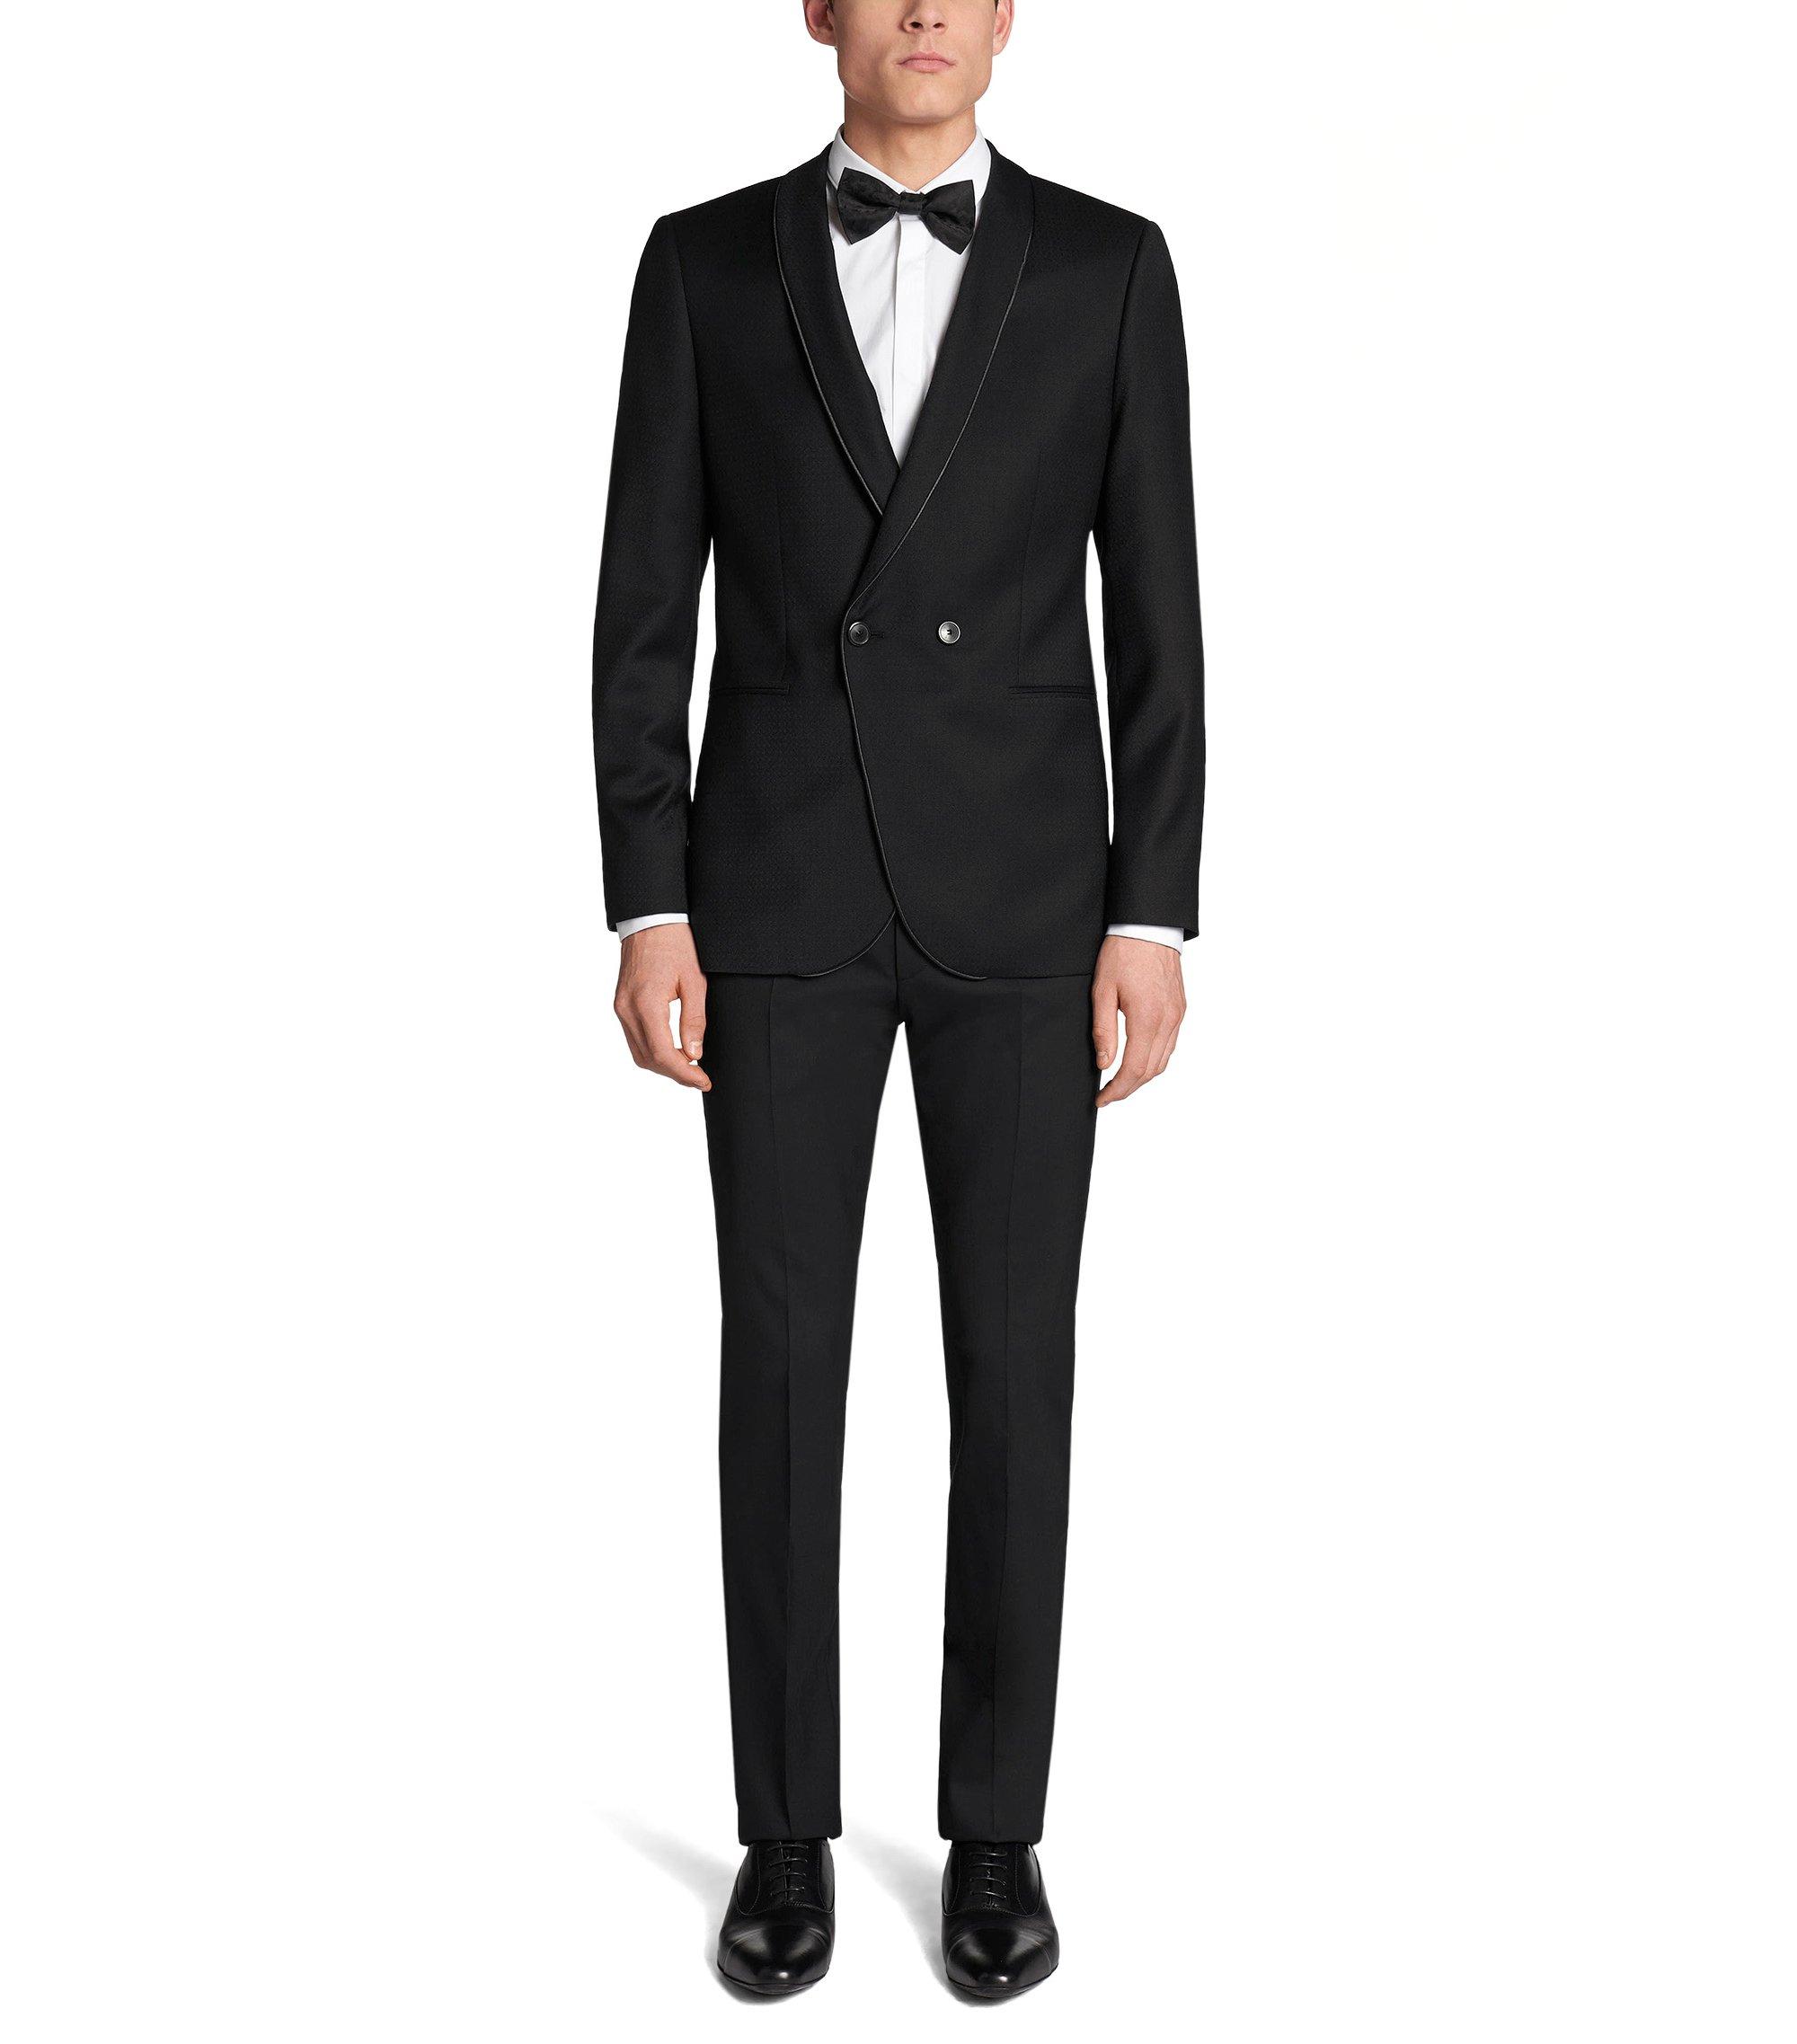 Stretch Virgin Wool Blend Sport Coat, Slim Fit   Anz, Black